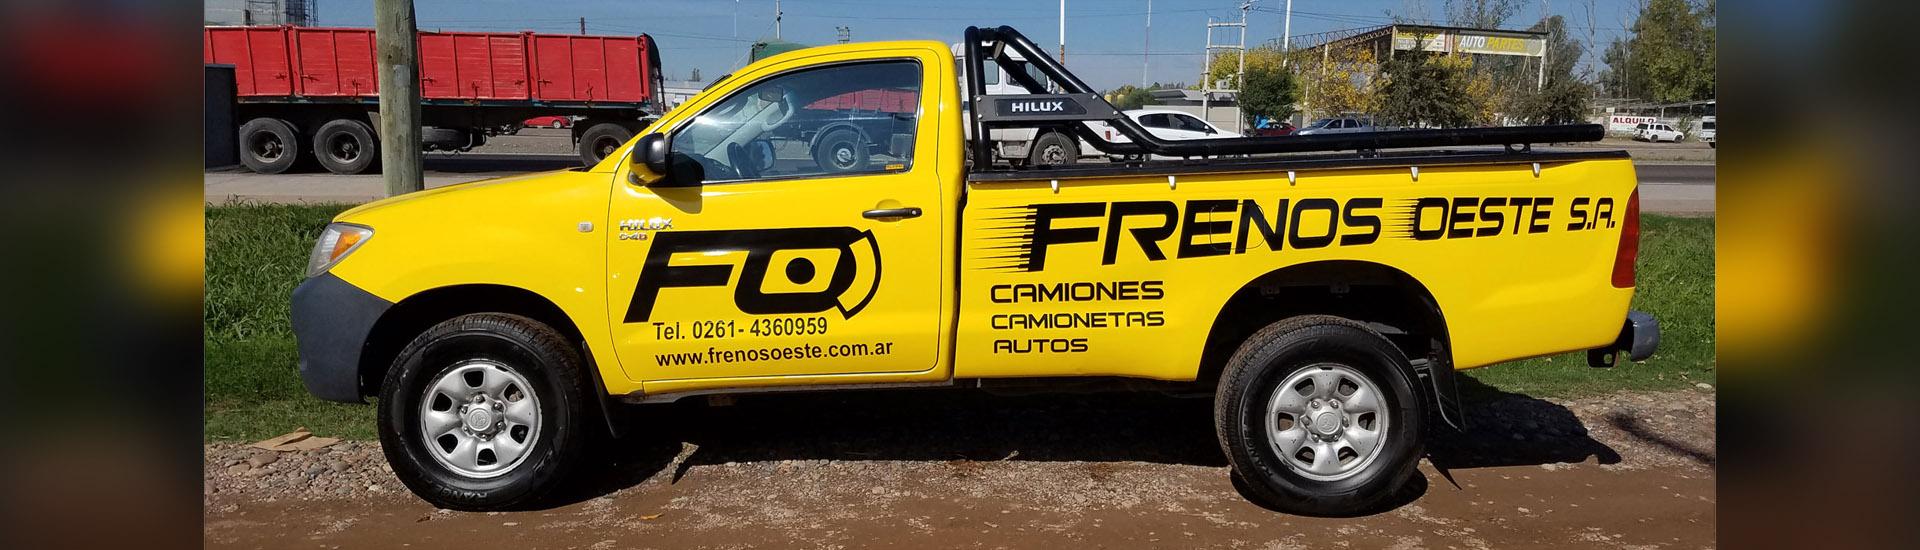 Servicio de Auxilio Toyota Hilux